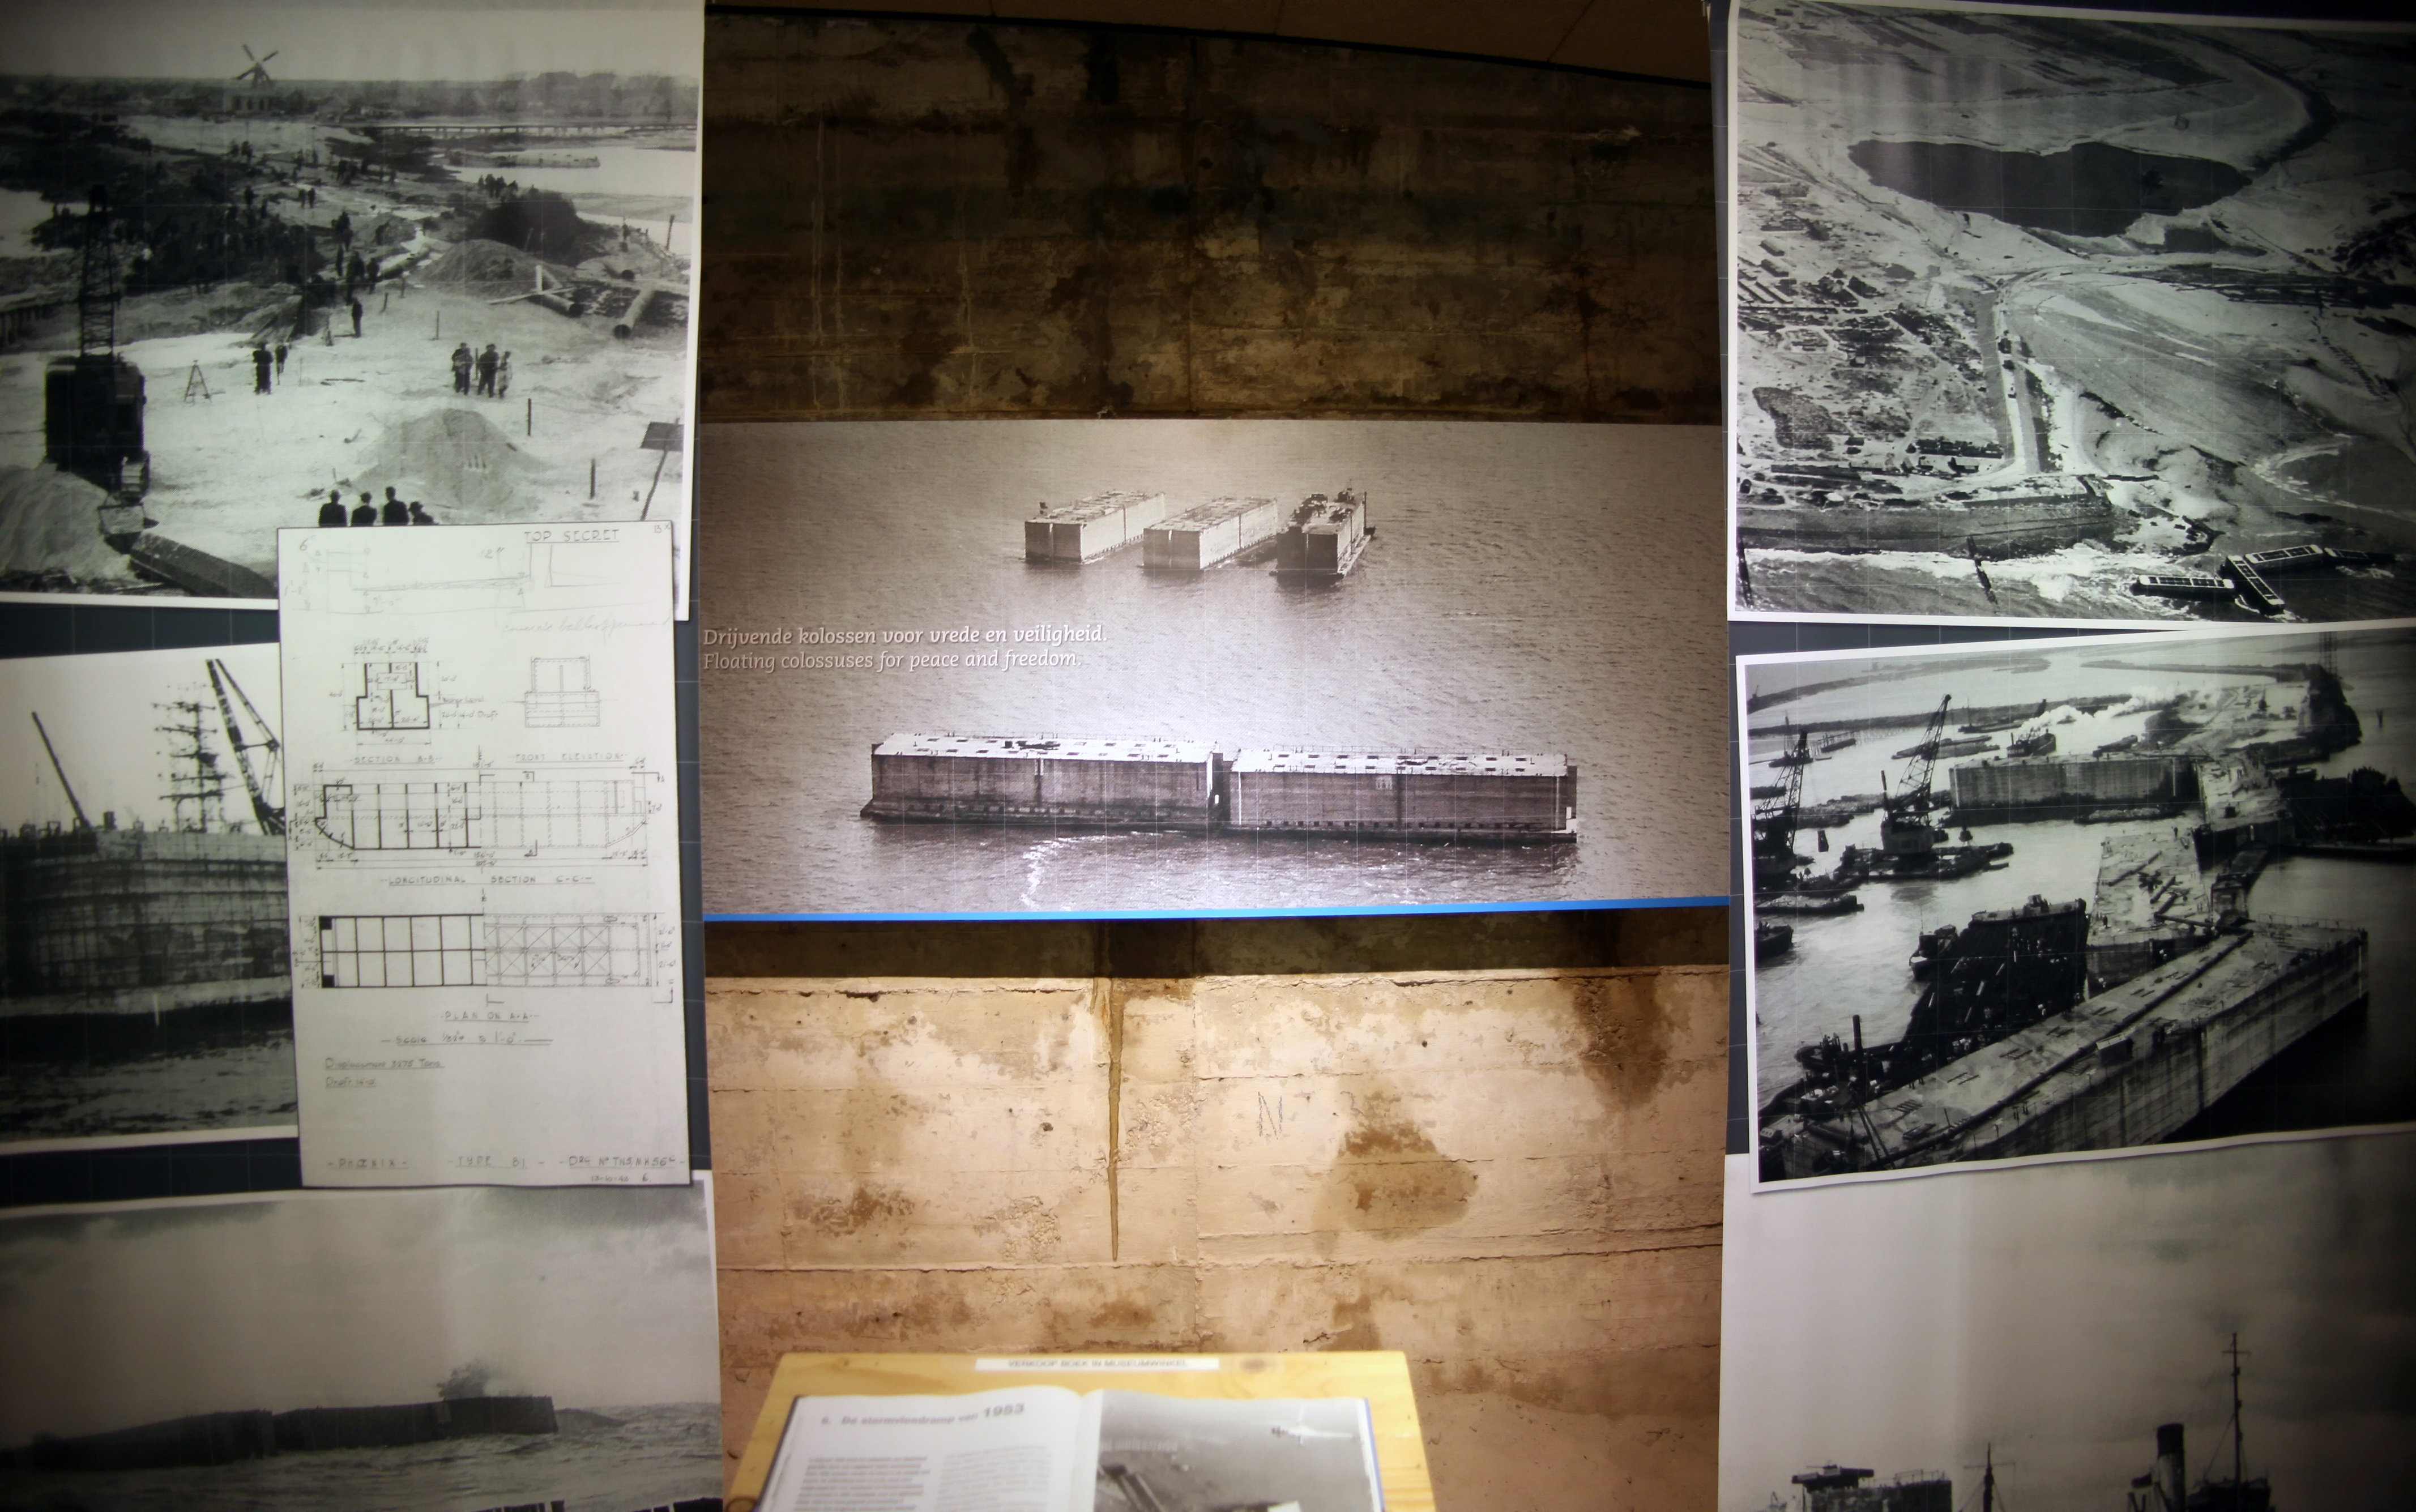 Greenville Flood Museum